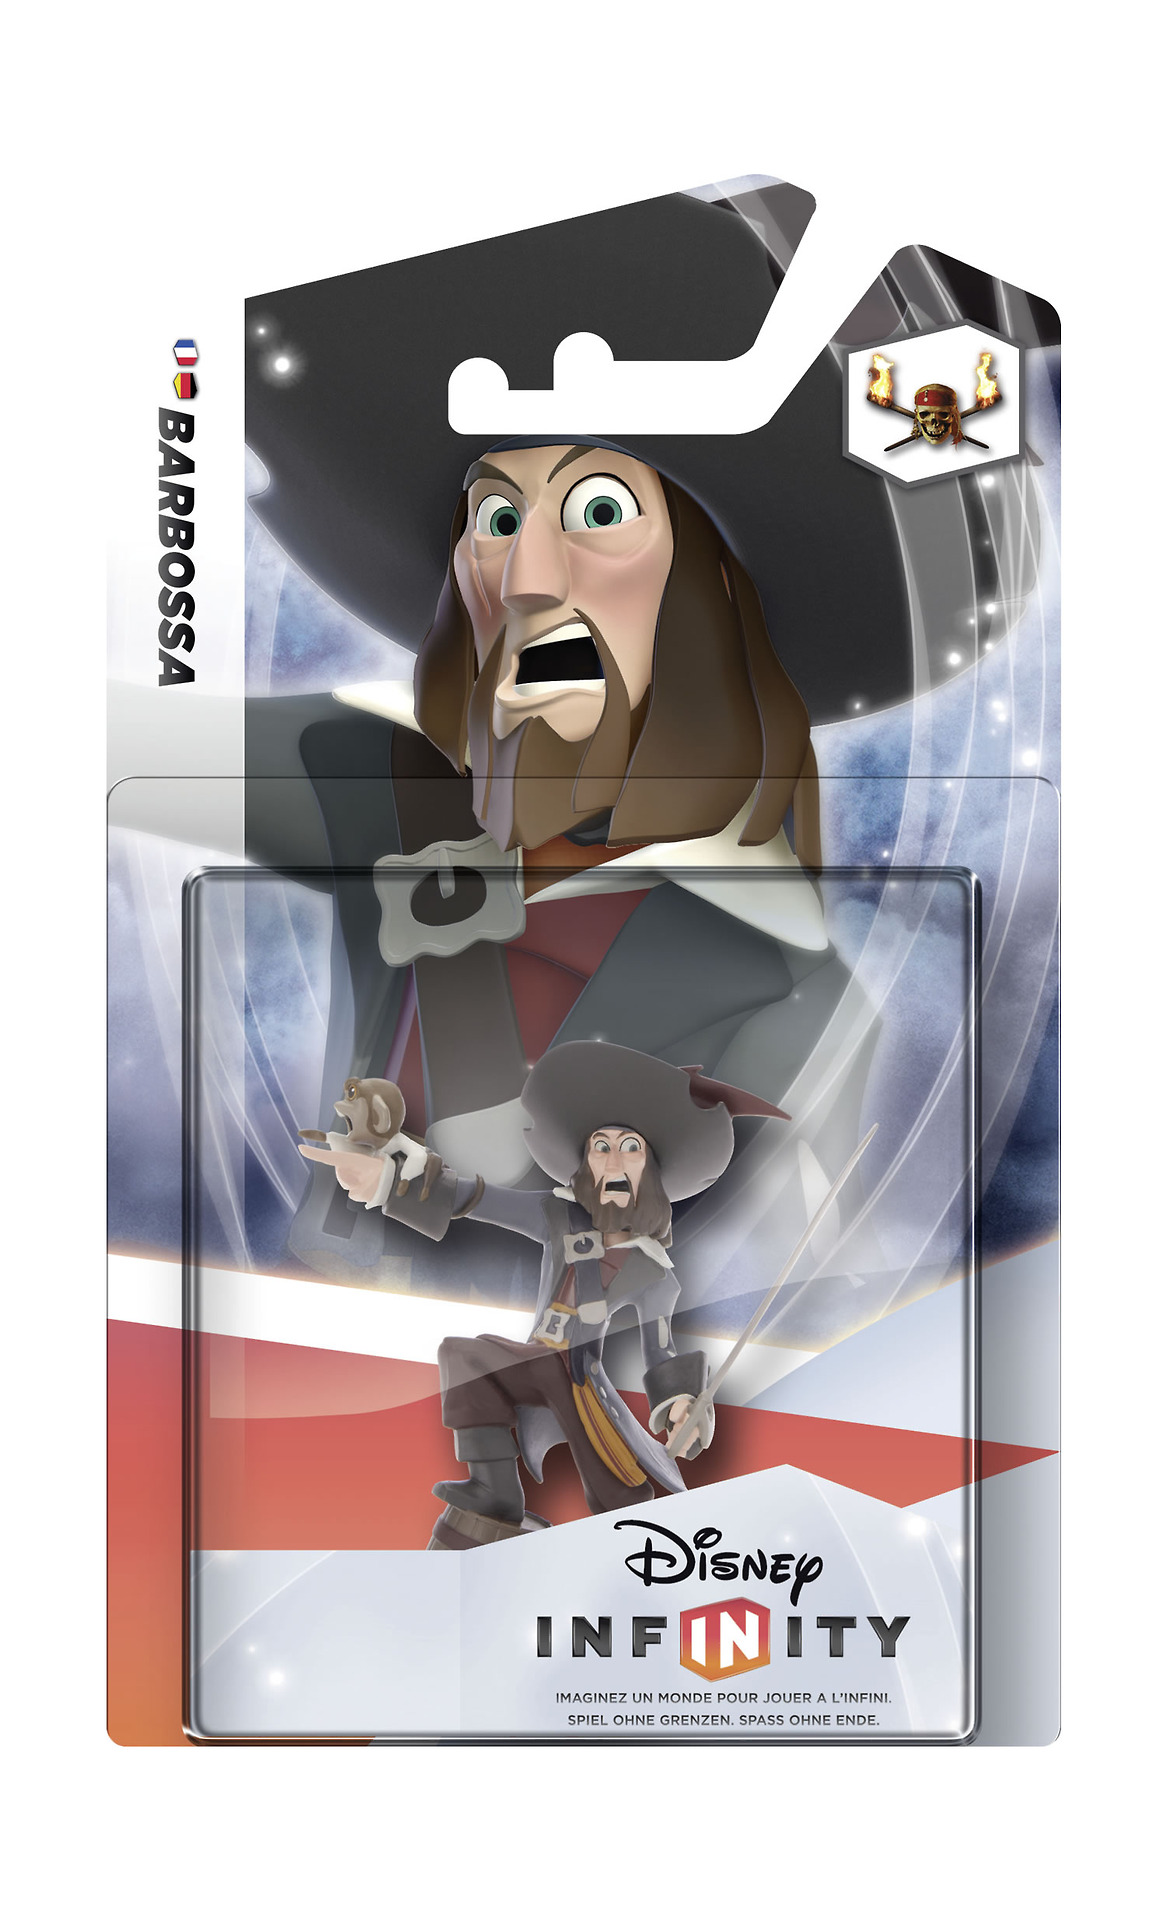 Disney Infinity: Figurka Barbossa (Piráti) OEM